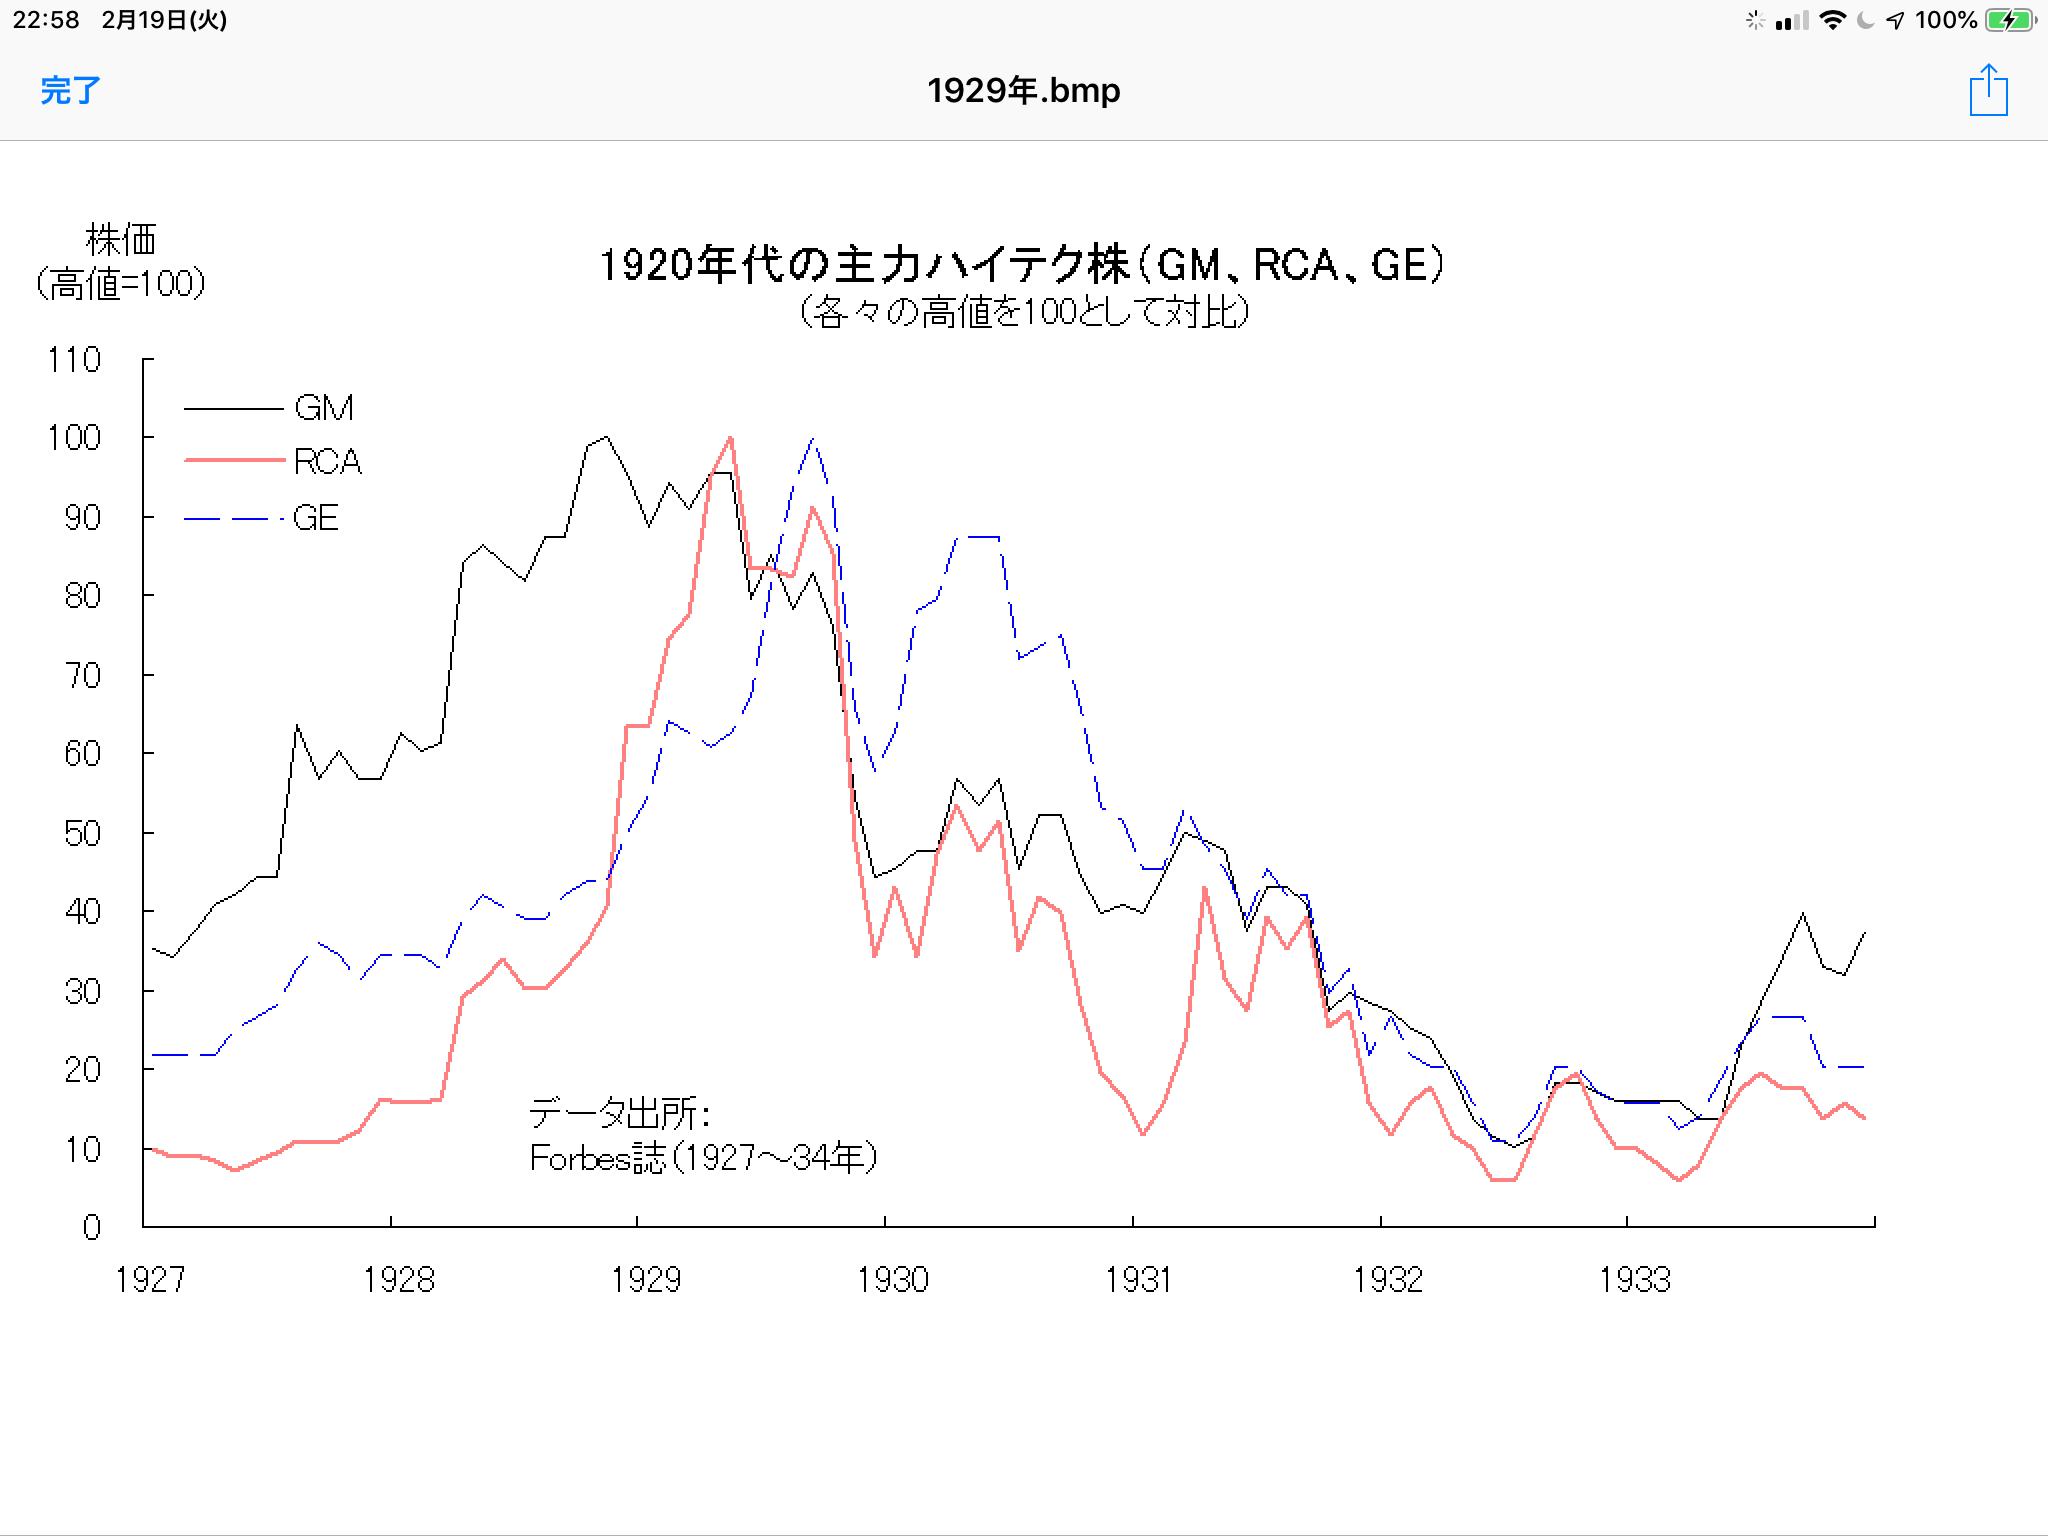 株価 gm